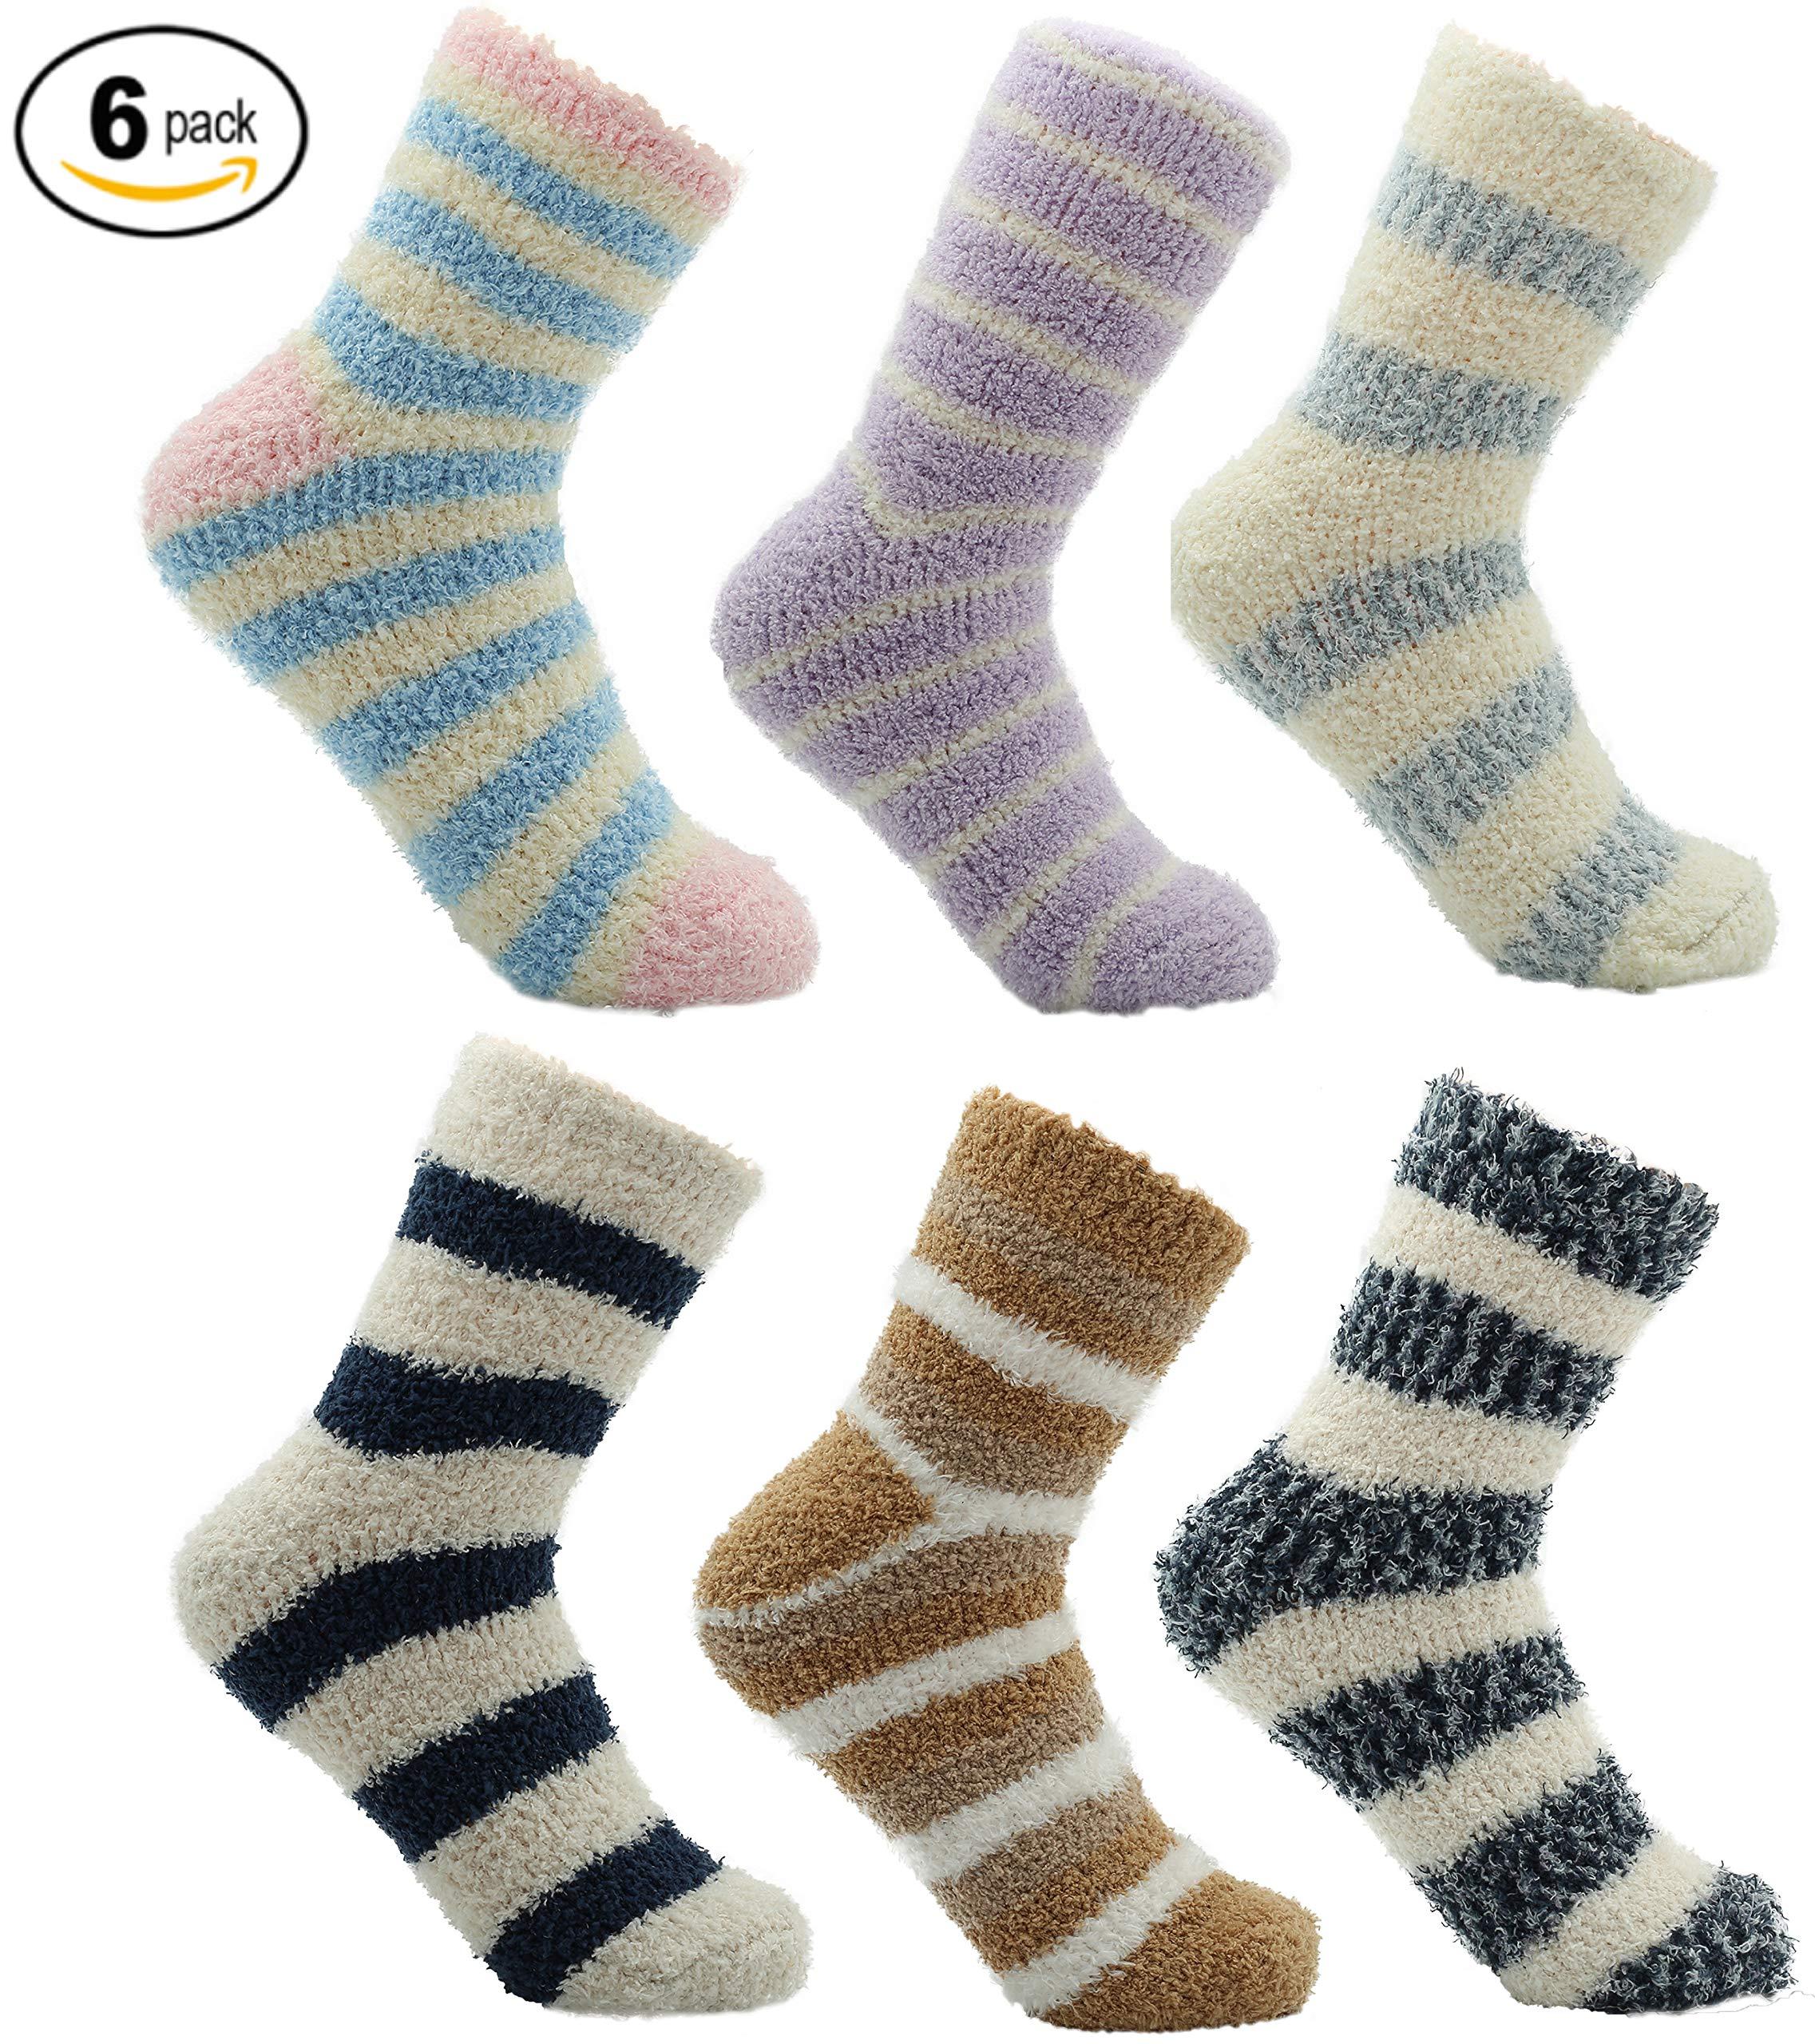 Cosy Socks for Women Fluffy Super Soft Thermal Womens Loungewear Slipper Bed Socks Pack of 6